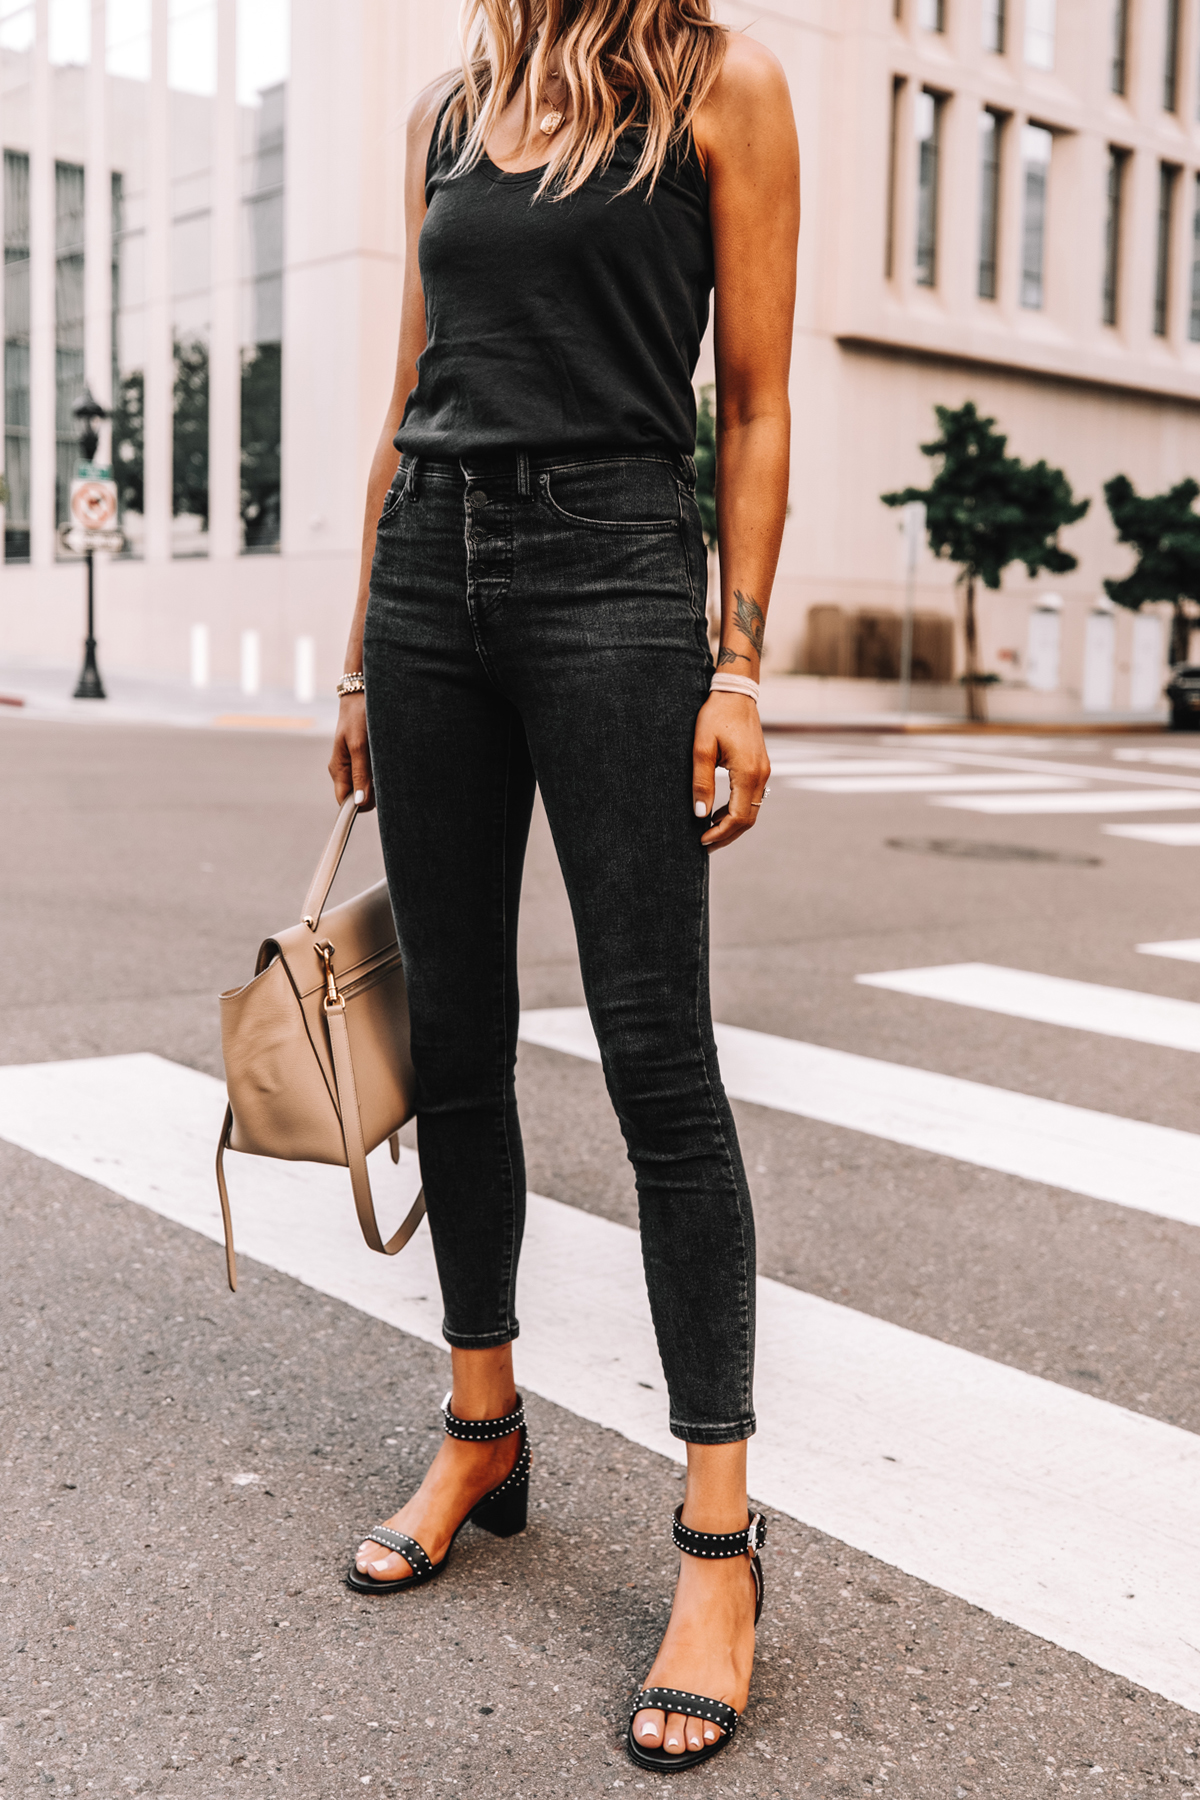 Fashion Jackson Wearing Everlane Black The Air Cami Everlane Black Skinny Jeans Givenchy Black Elegant 60 studded leather sandals